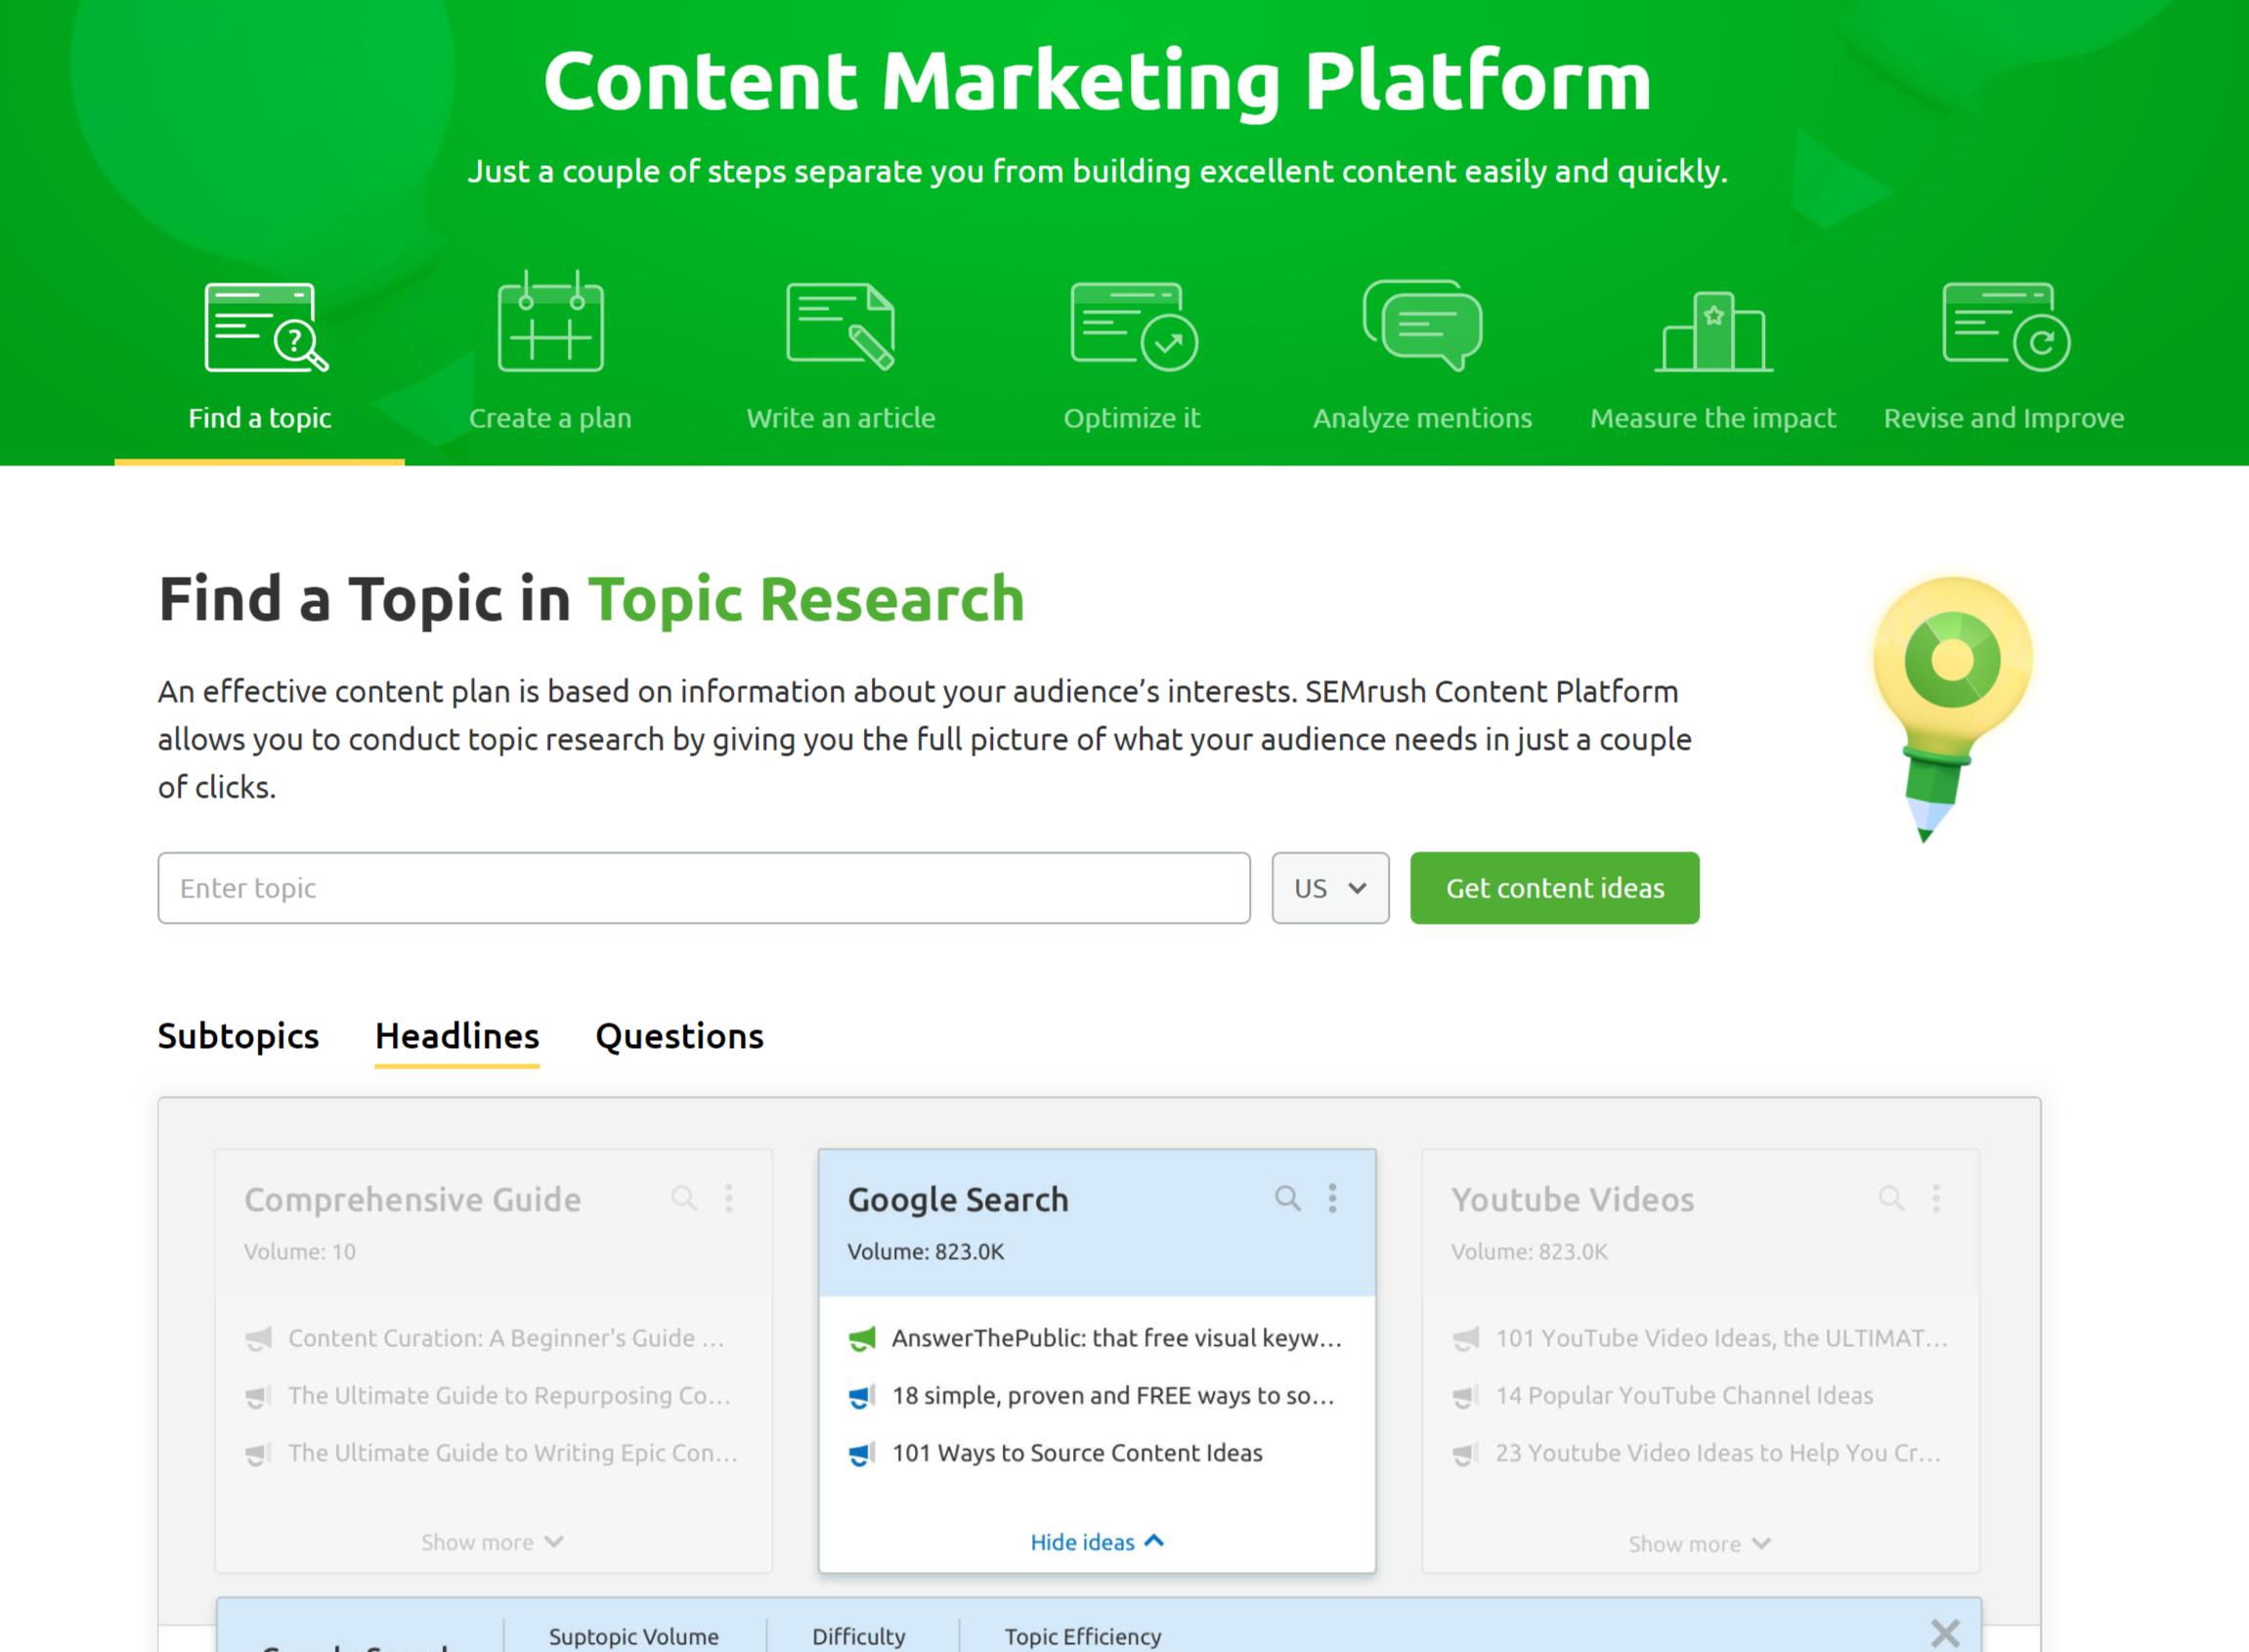 seo software - content marketing